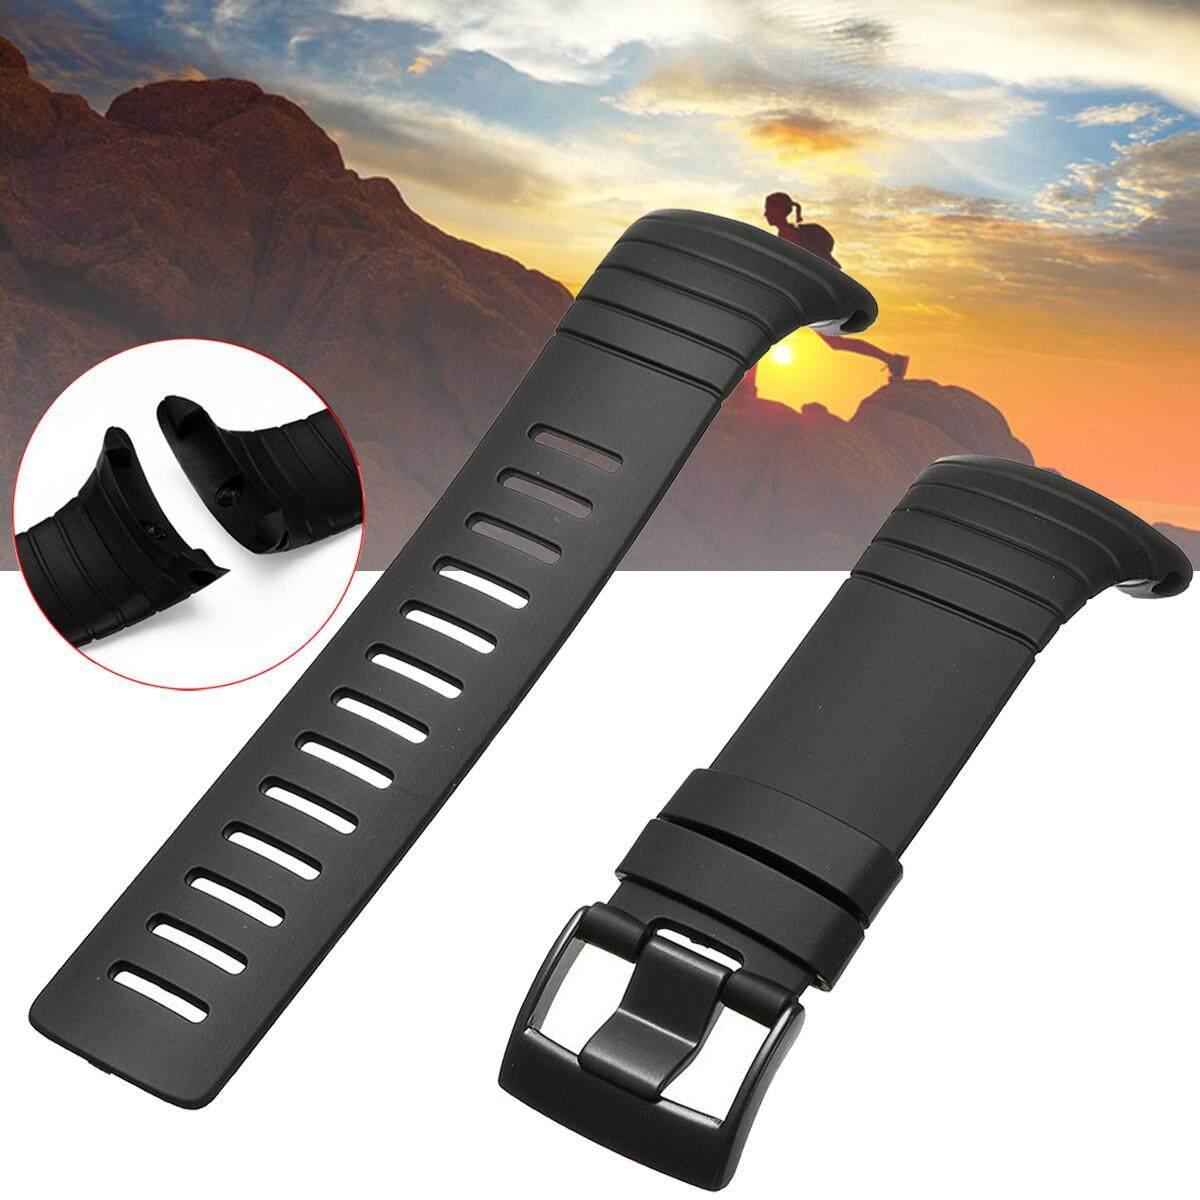 Replacement Silicone Rubber Watch Band Strap + Clasp Fastener For SUUNTO CORE Malaysia